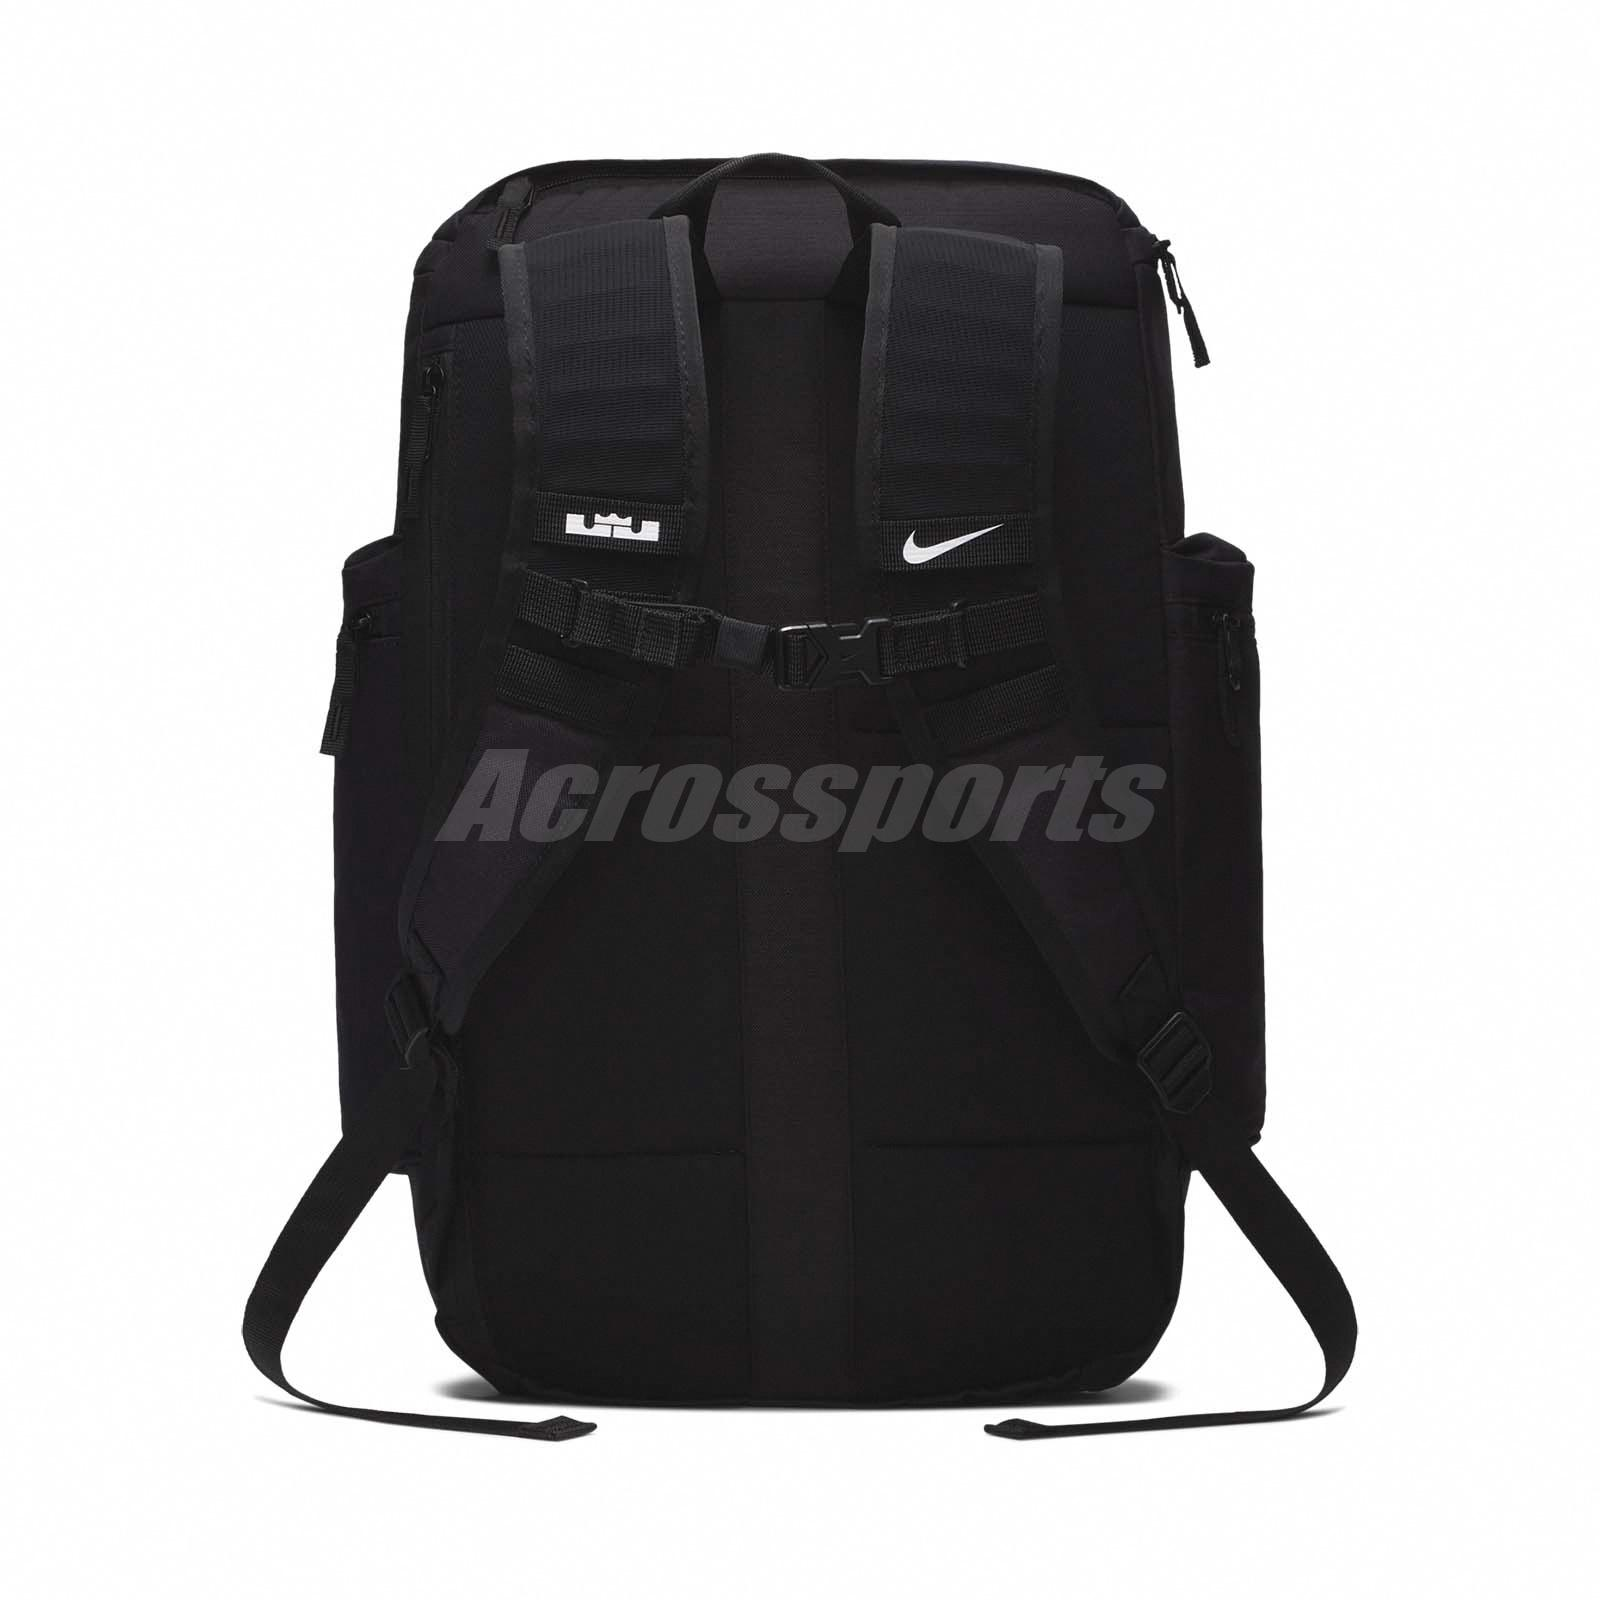 Details about Nike LeBron James Backpack Basketball Bag Max Air Training Gym  Black BA5563-010 6a18eaa28a